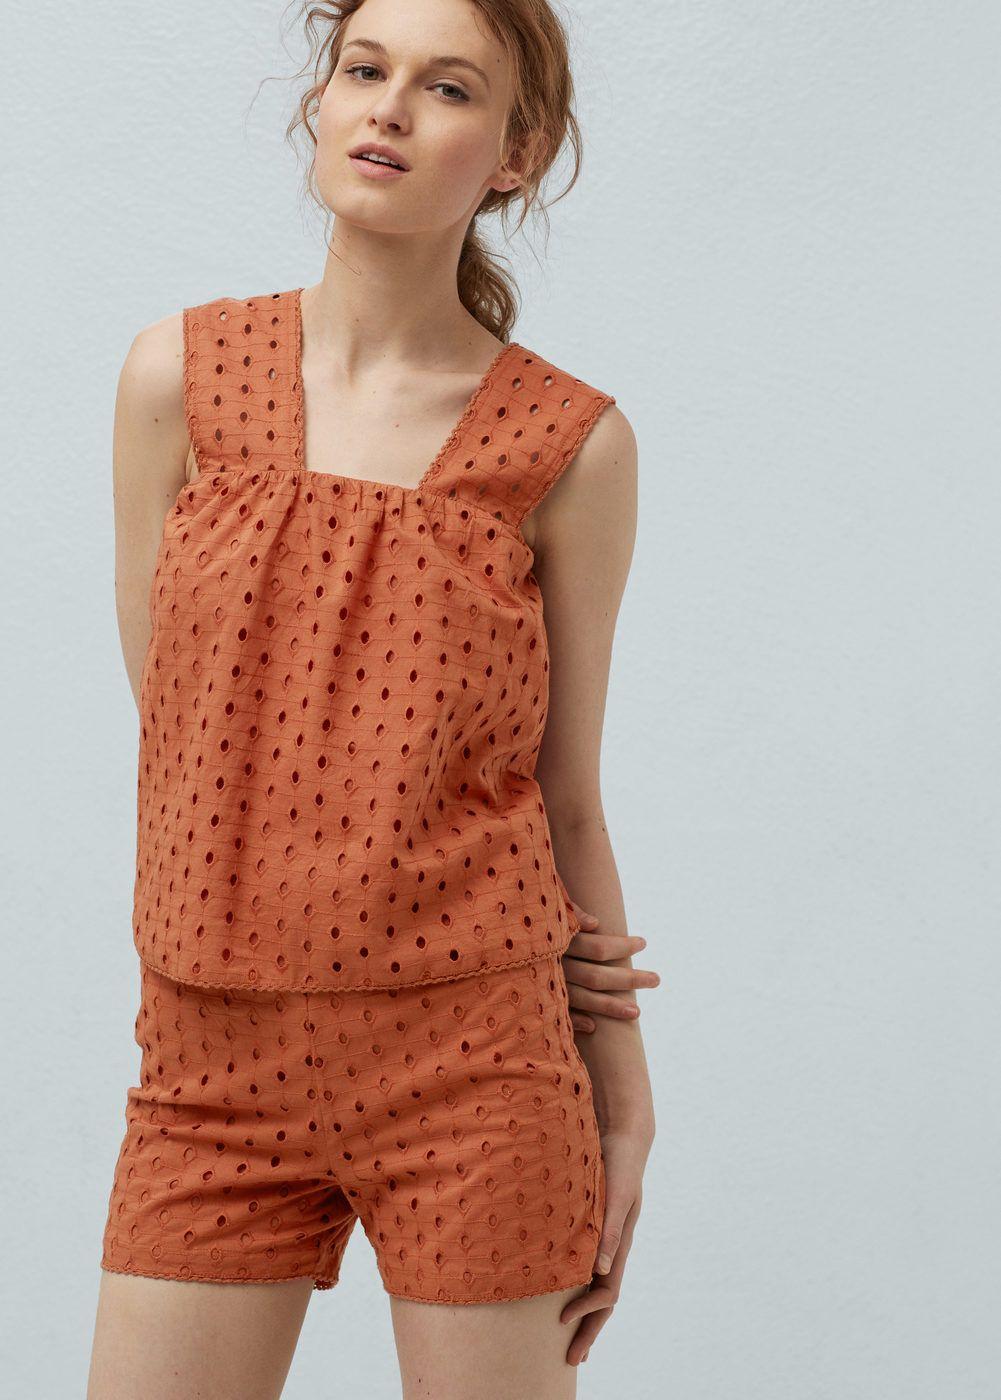 Shirts - Sale - Woman | MANGO United Kingdom